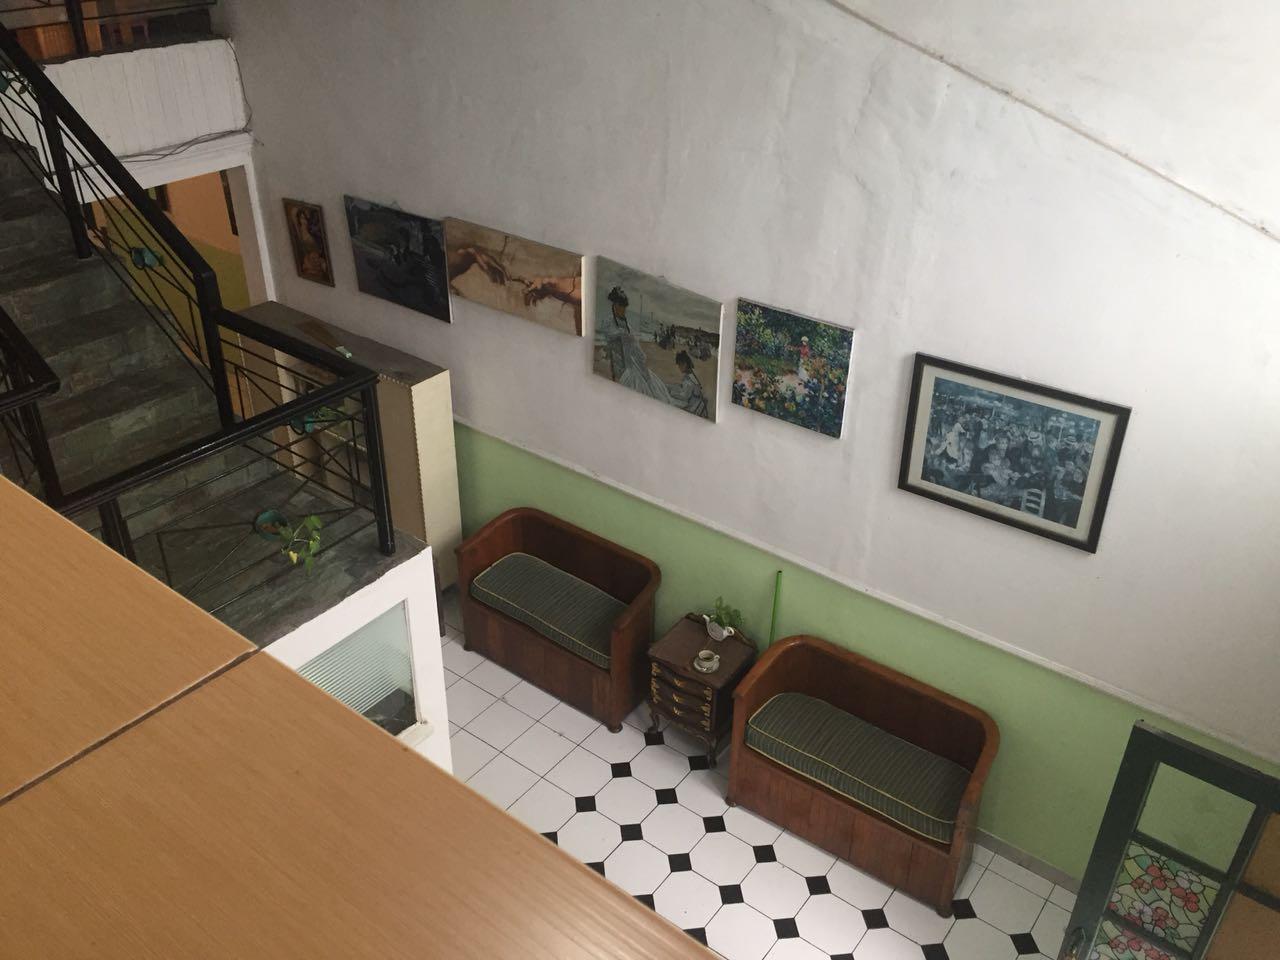 Lokasi Puri Senayan 28 Single Bed Room Jl. Senayan No.4, RT.1/RW.6, Rawa Baru, Kebayoran Baru Jakarta Selatan